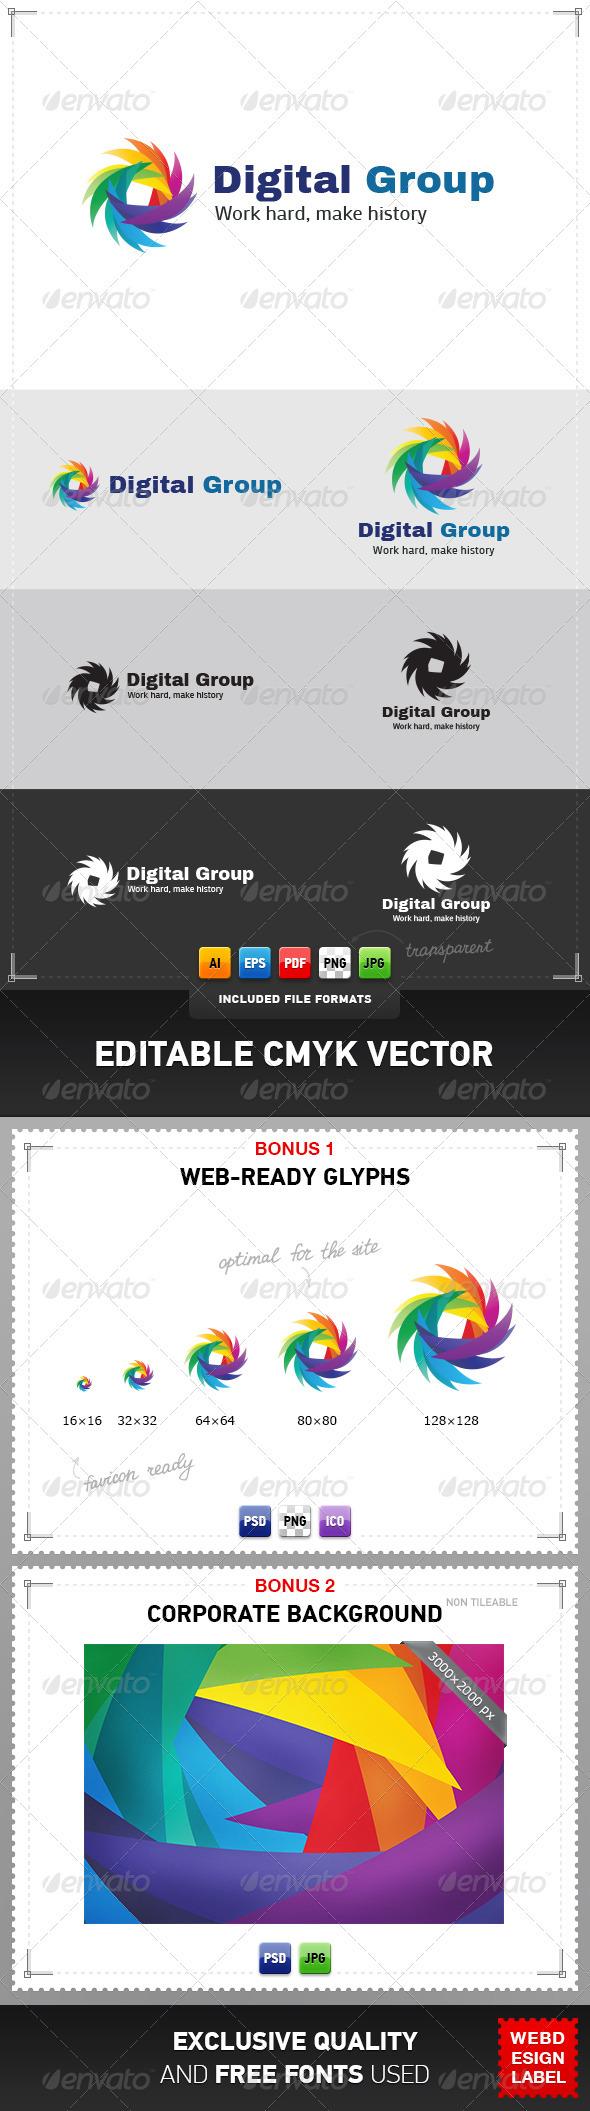 Digital Group Logo - Vector Abstract